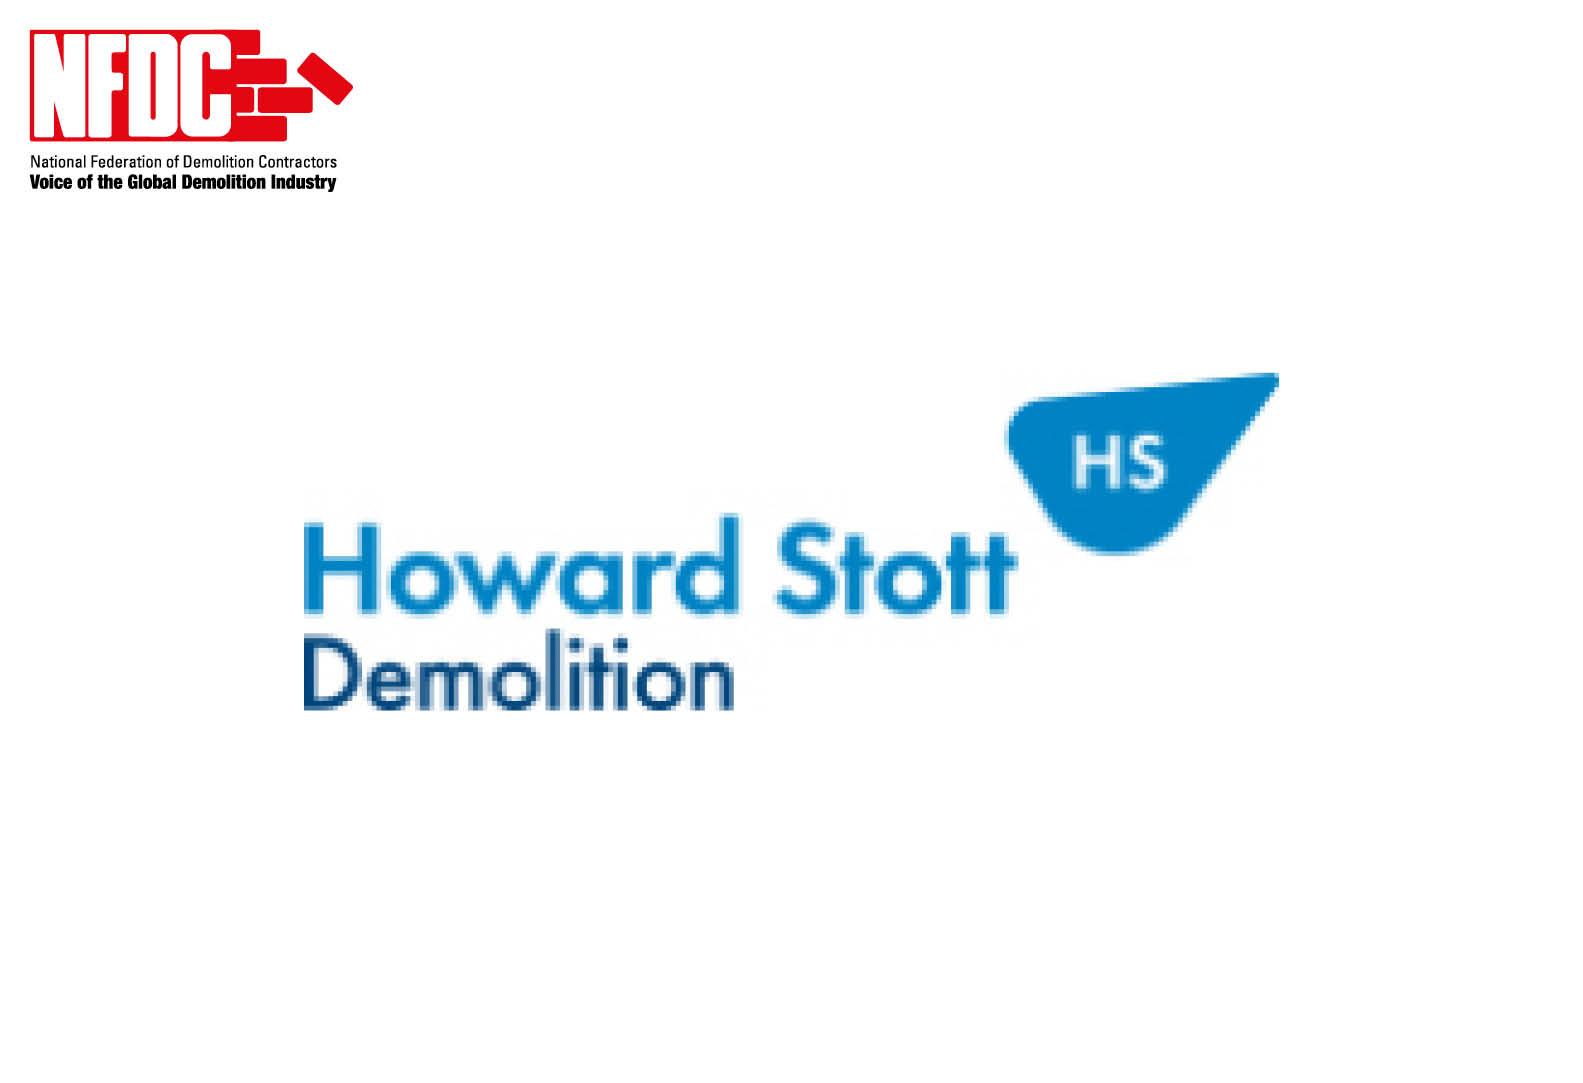 Howard Stott